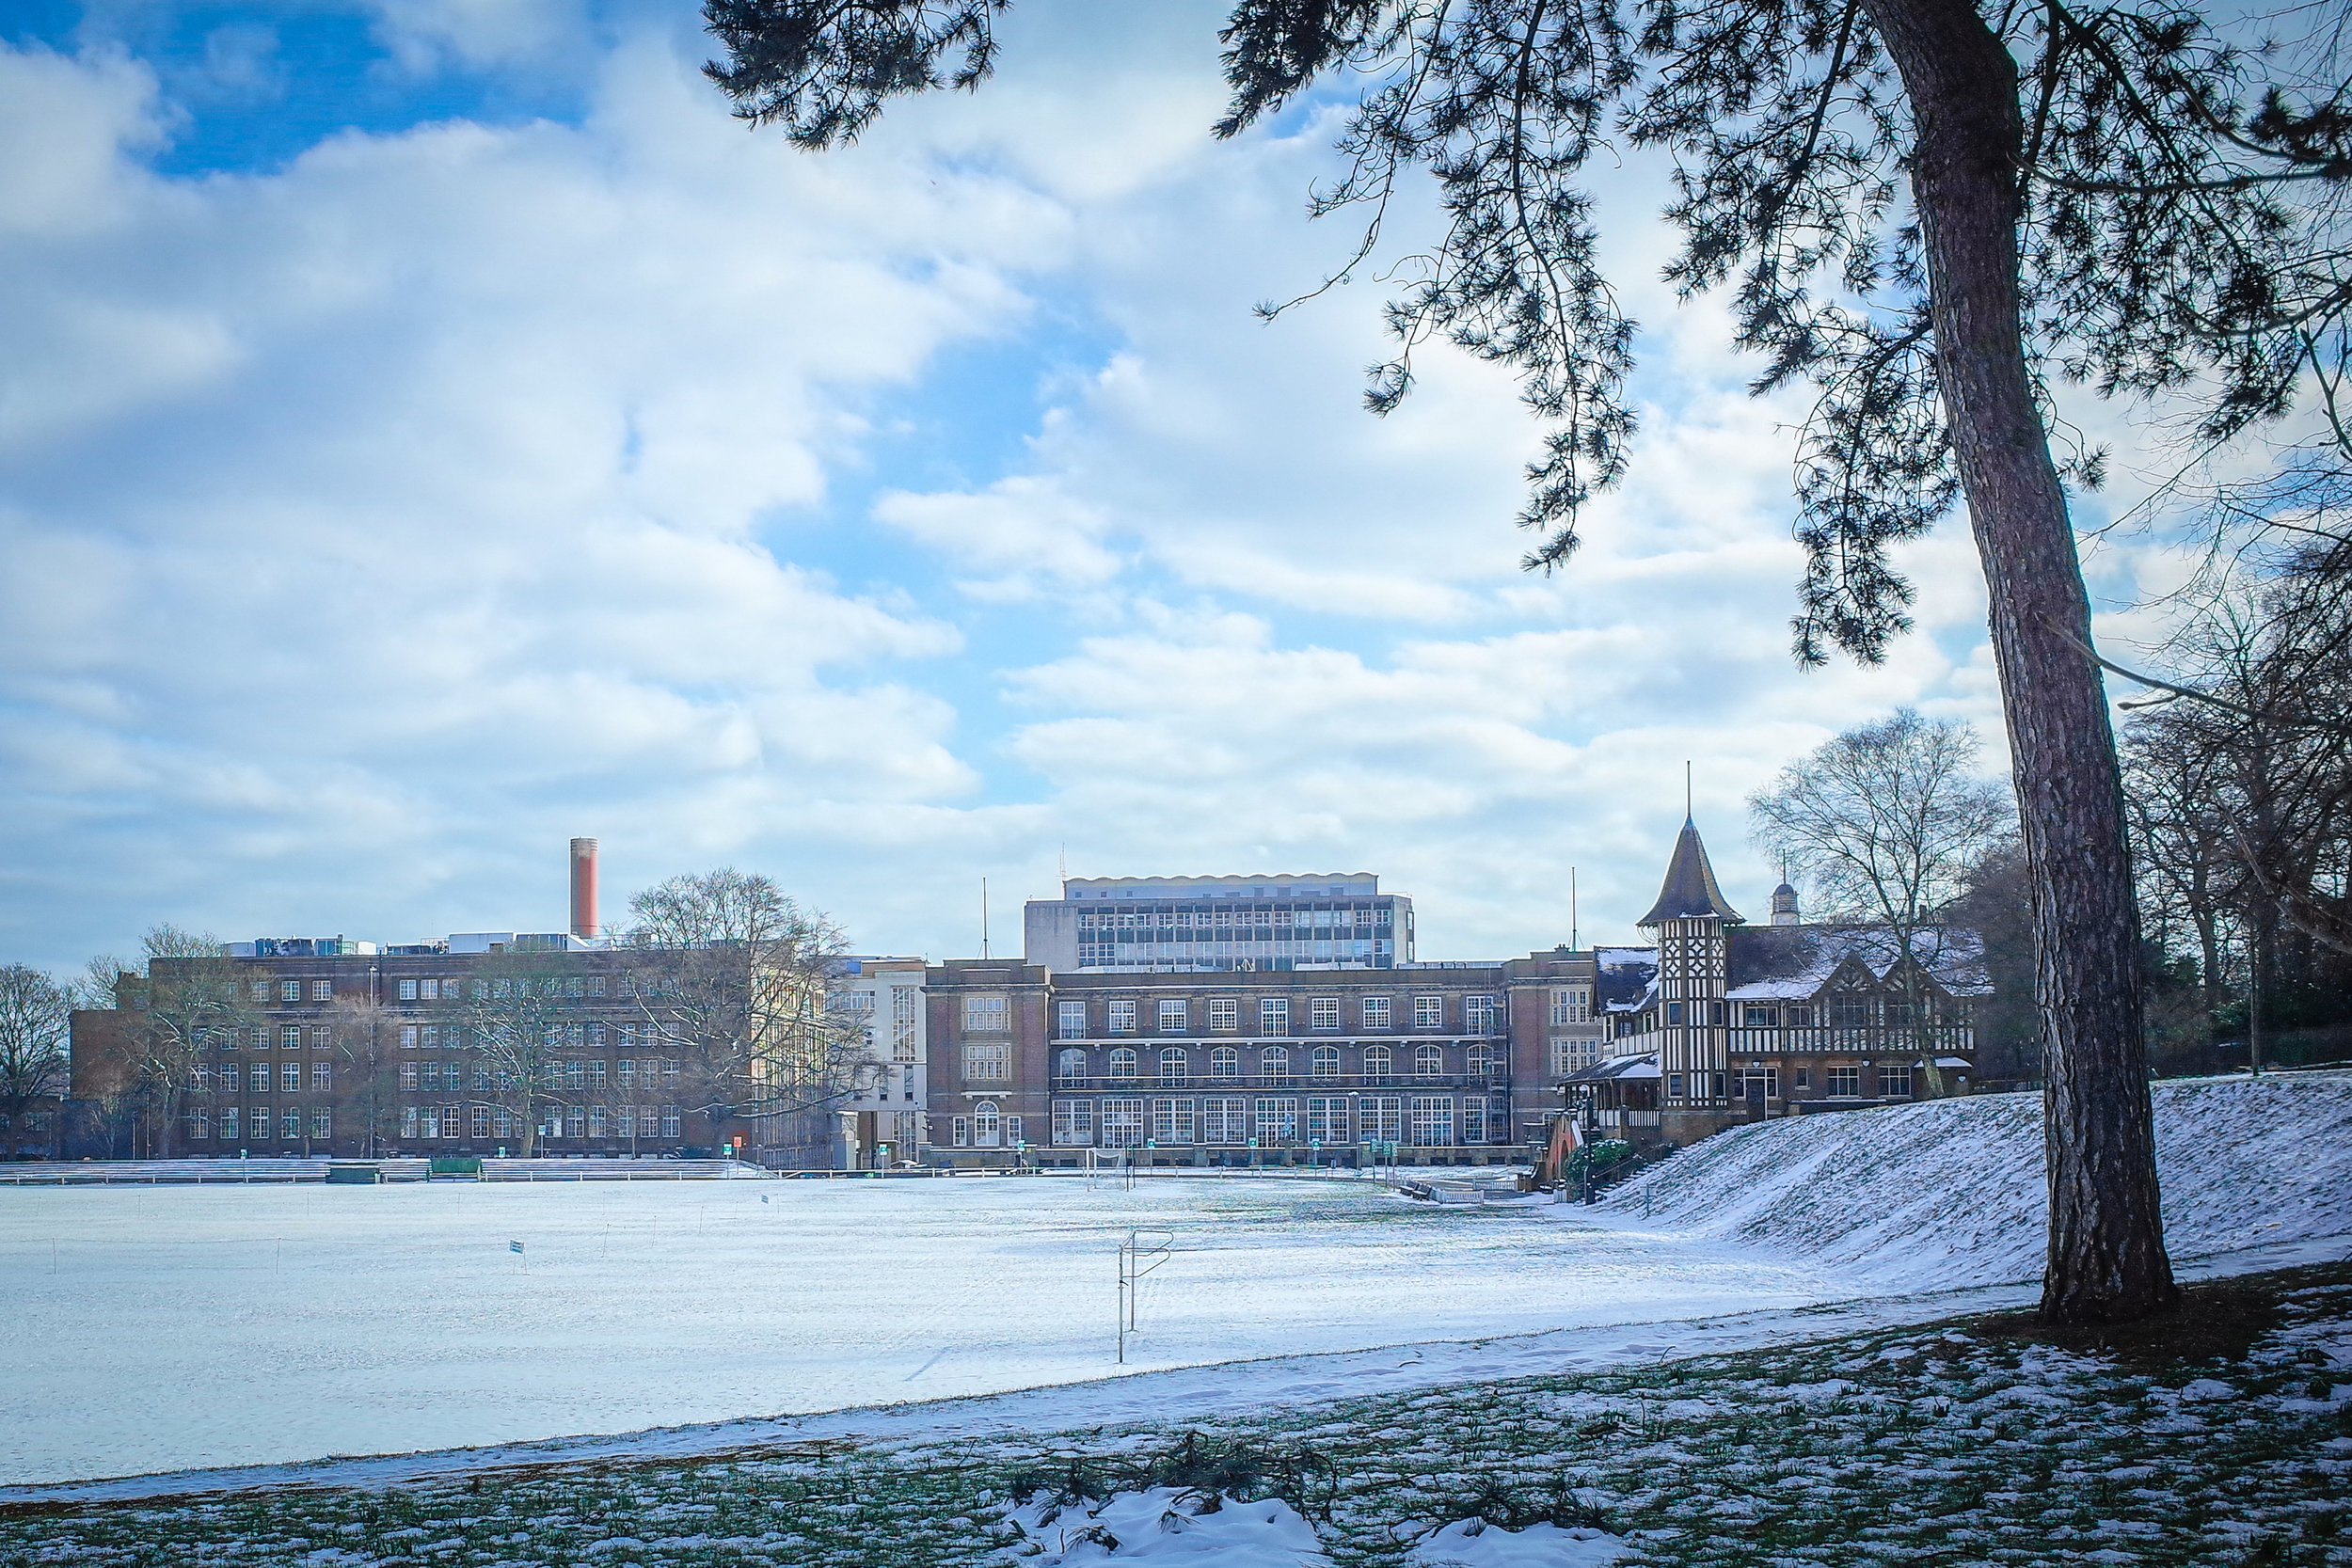 Snowy Cadbury Factory